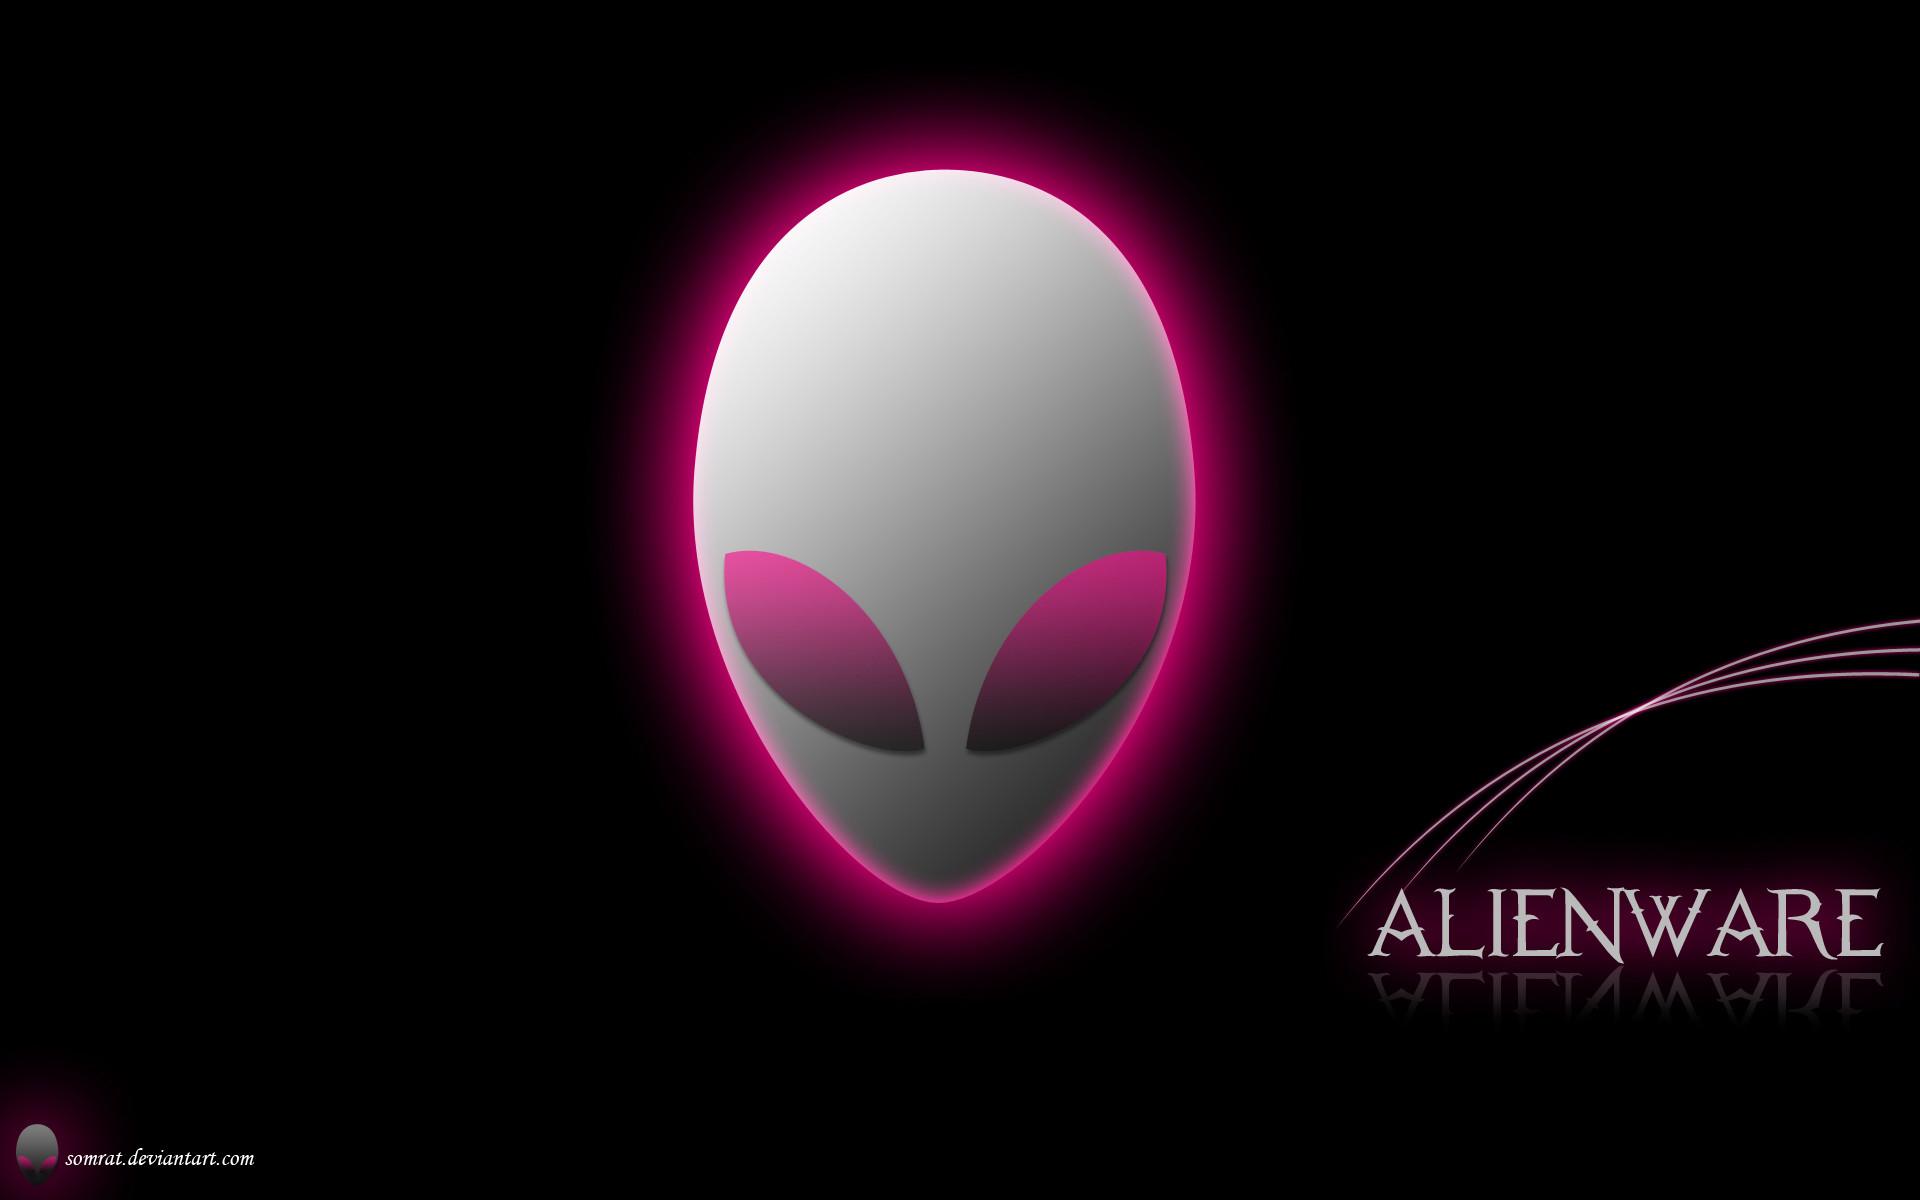 Alienware Live Wallpapers (68+ images)